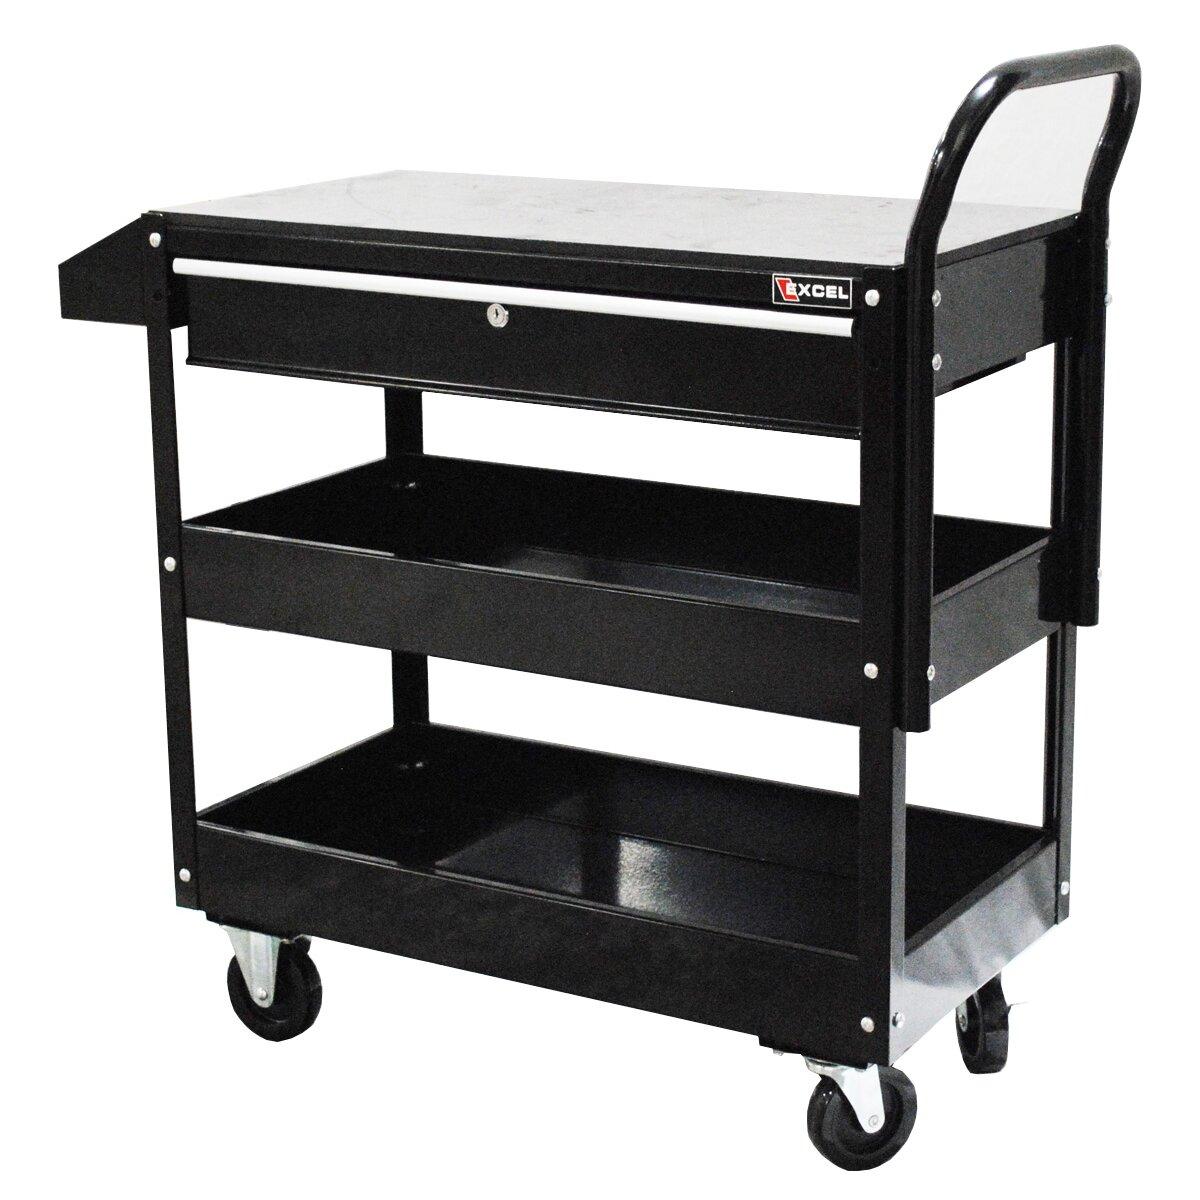 Metal Utility Cart: Excel Metal Utility Cart & Reviews